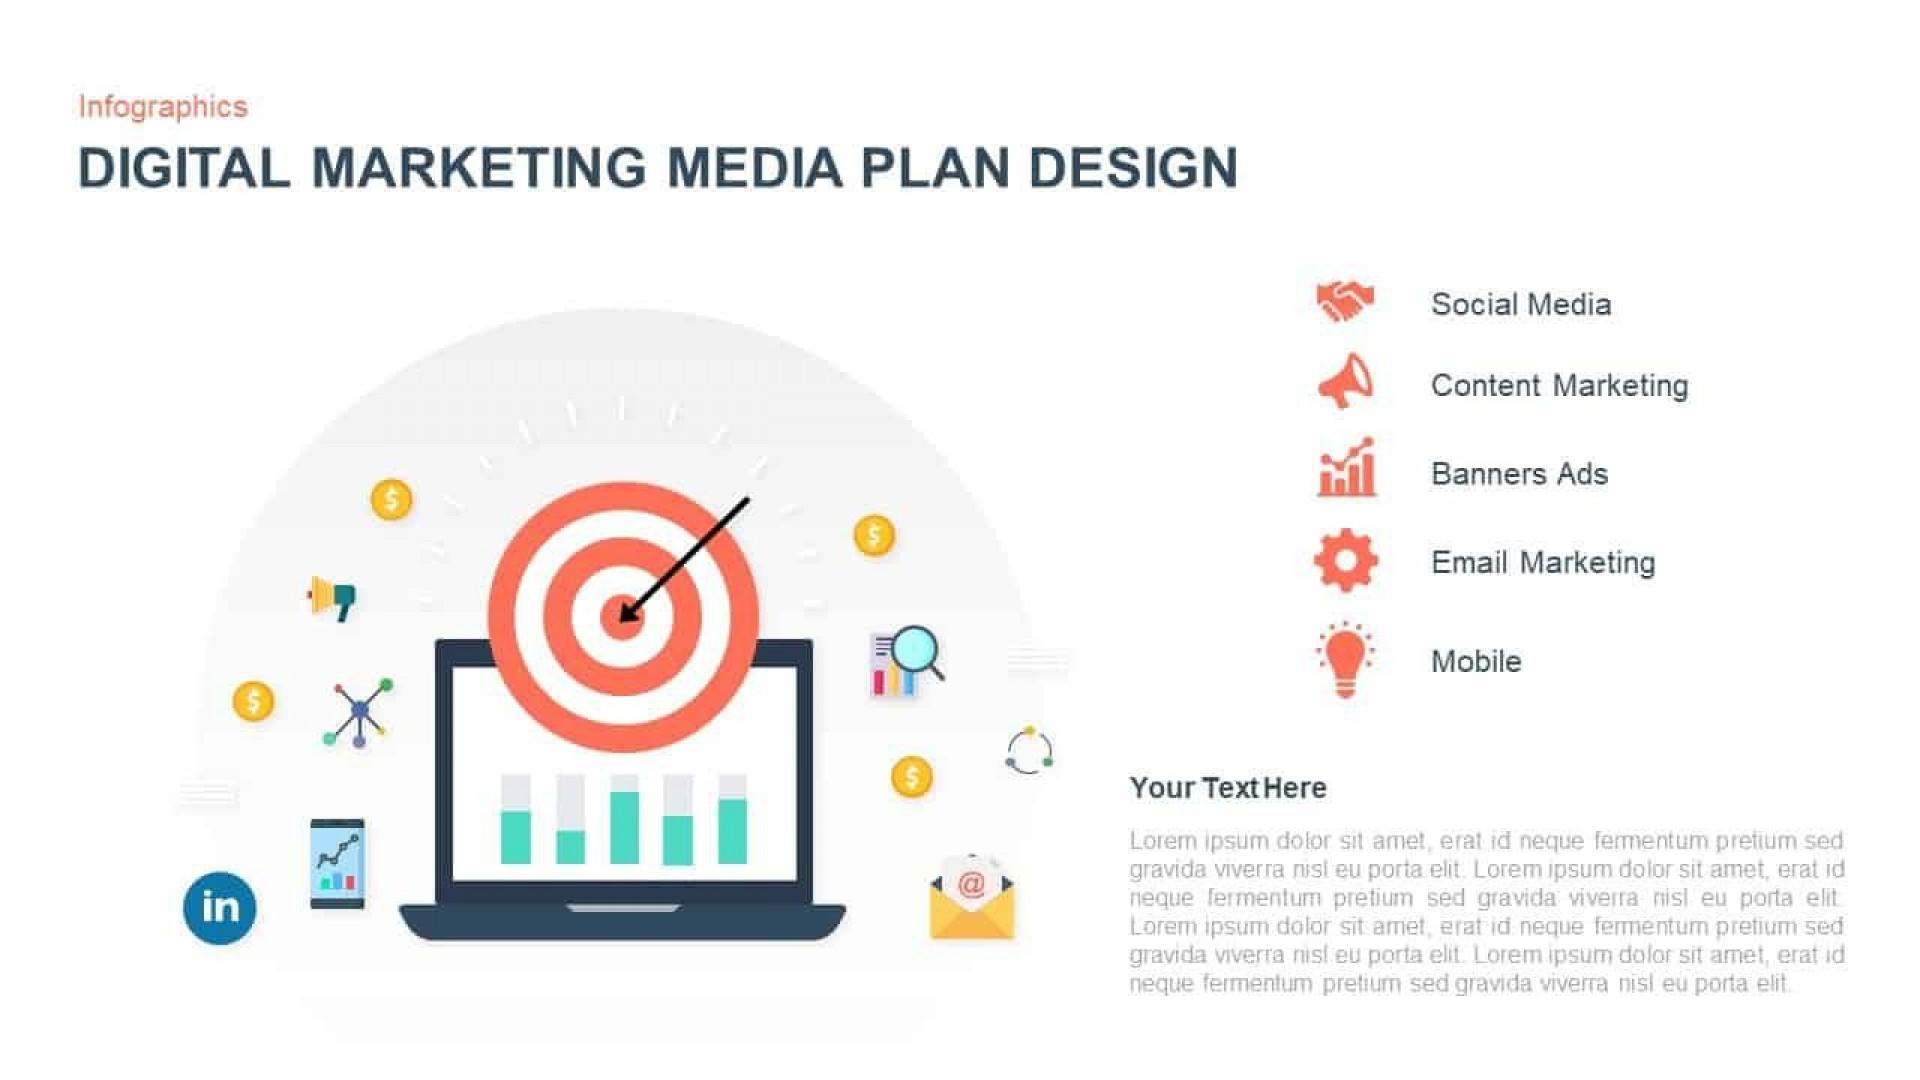 006 Unique Digital Marketing Plan Template High Resolution  .xl Doc1920